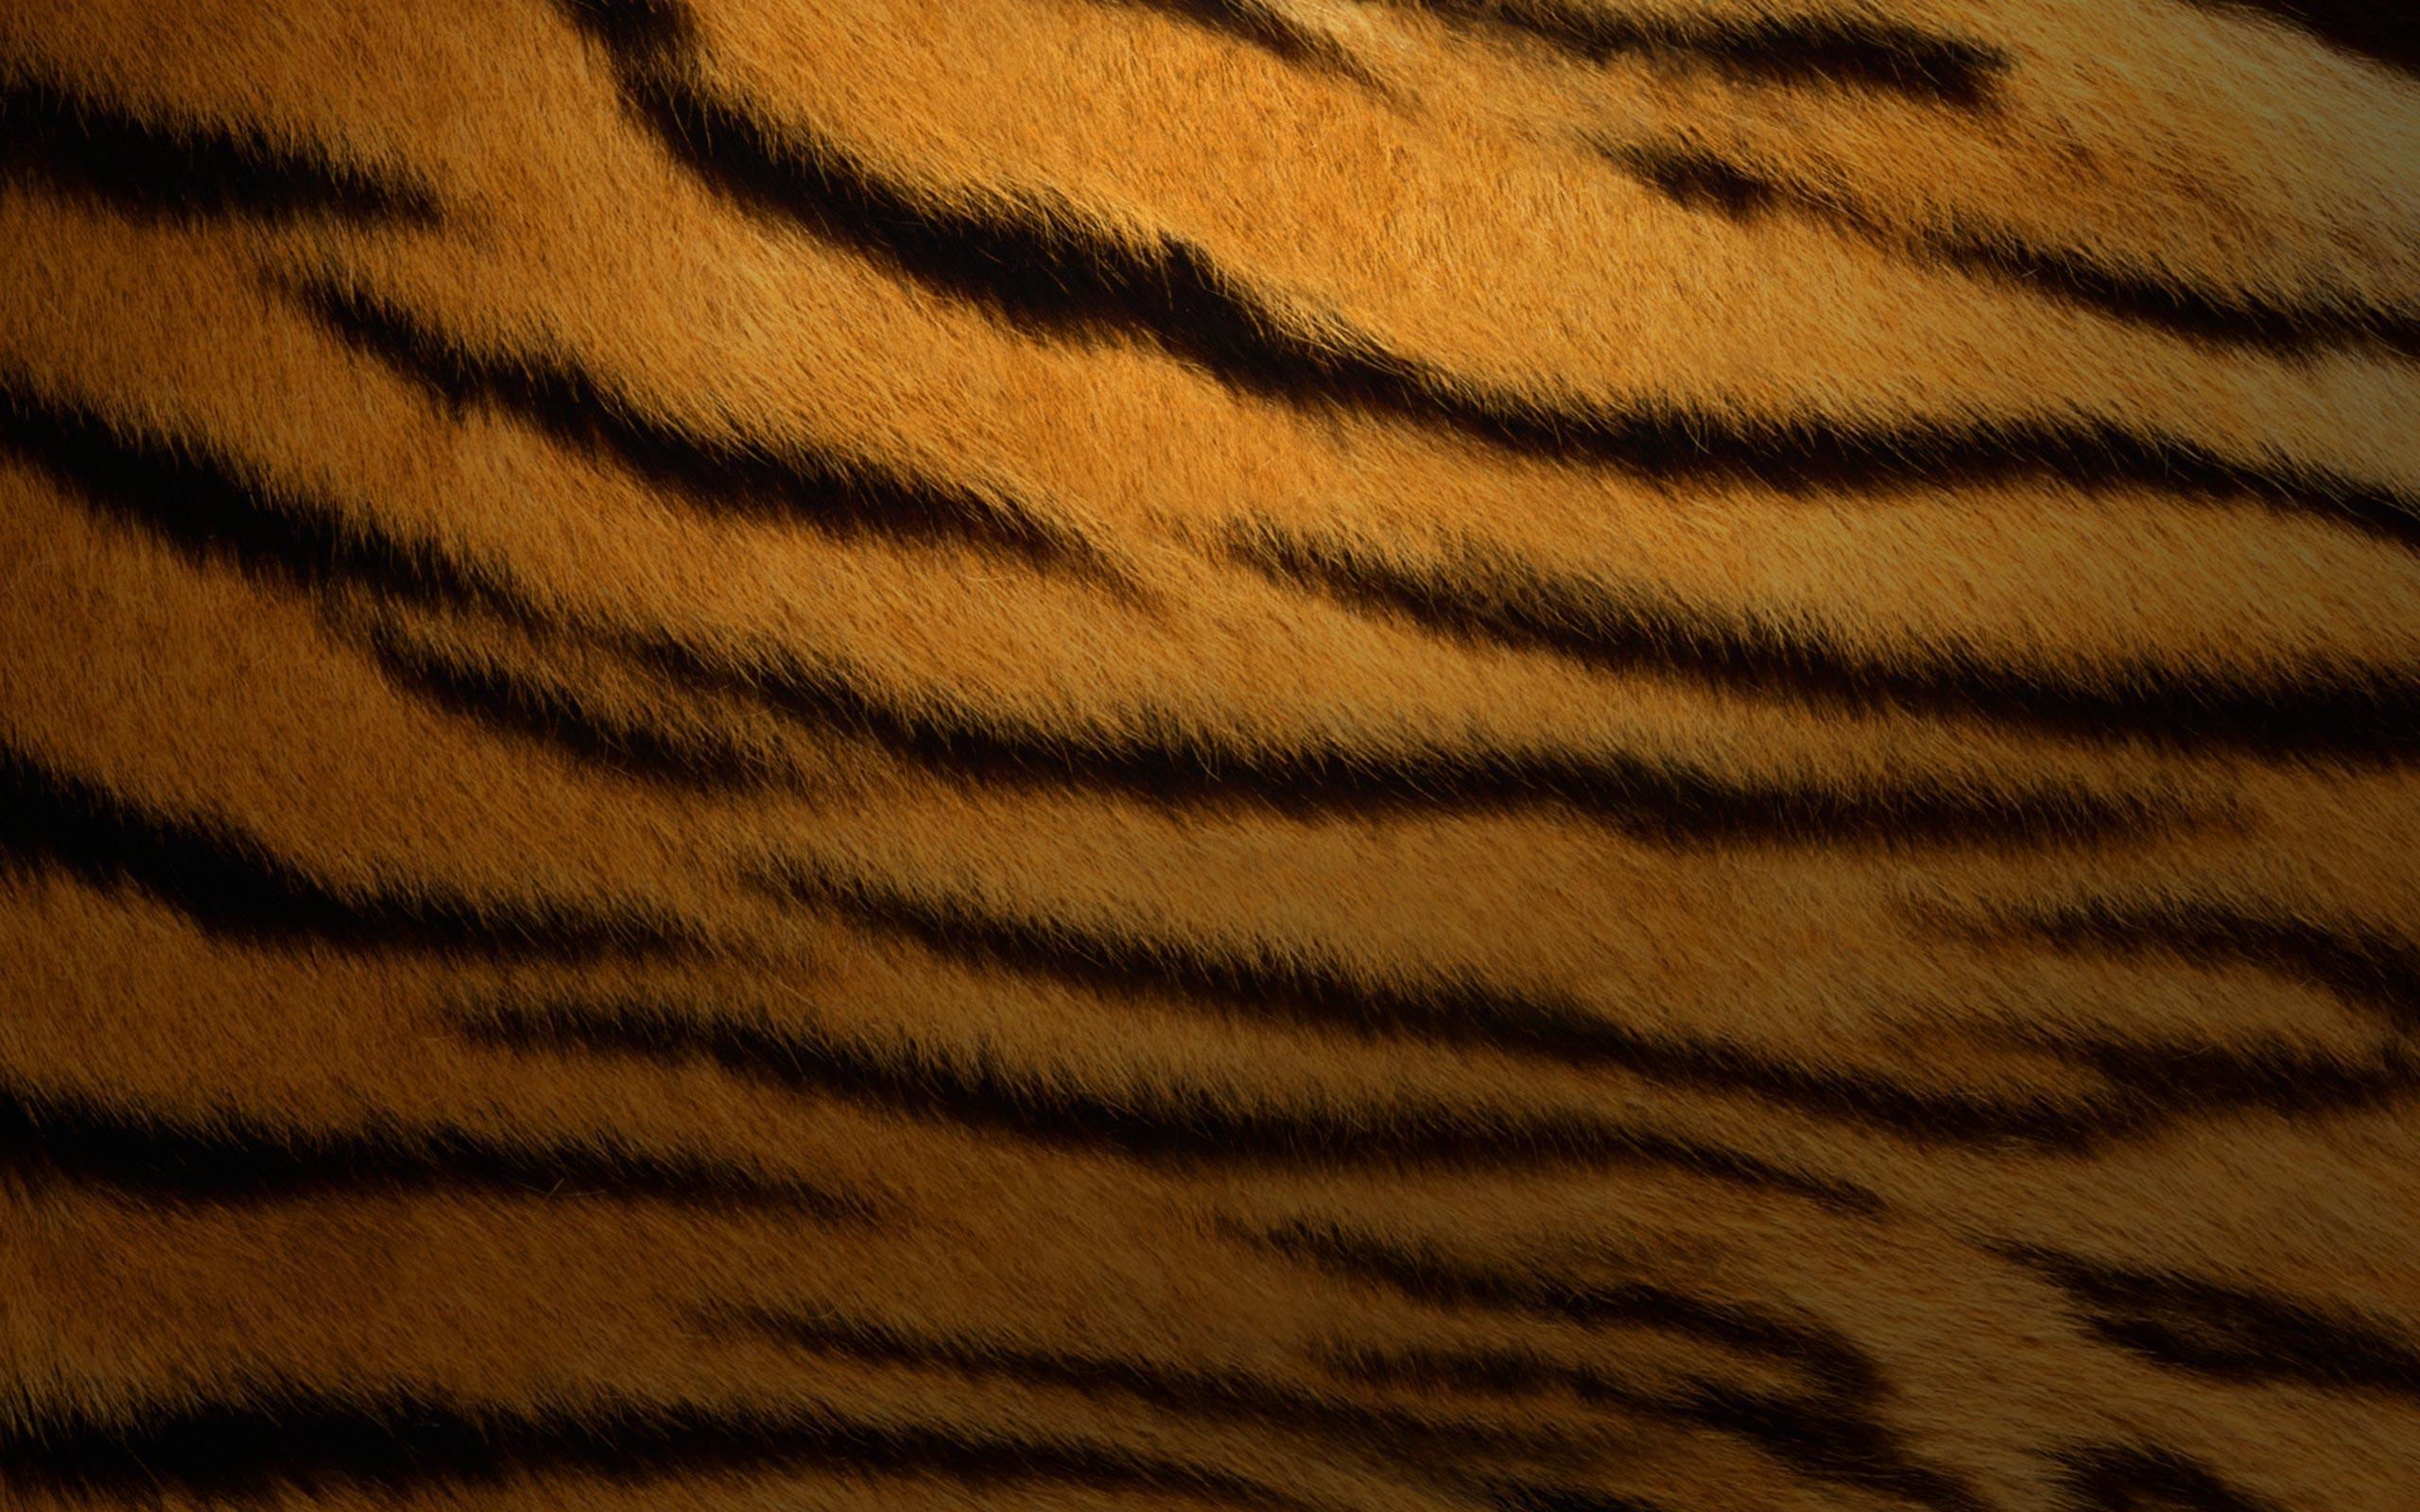 Fondos de pantalla Textura Piel de Tigre